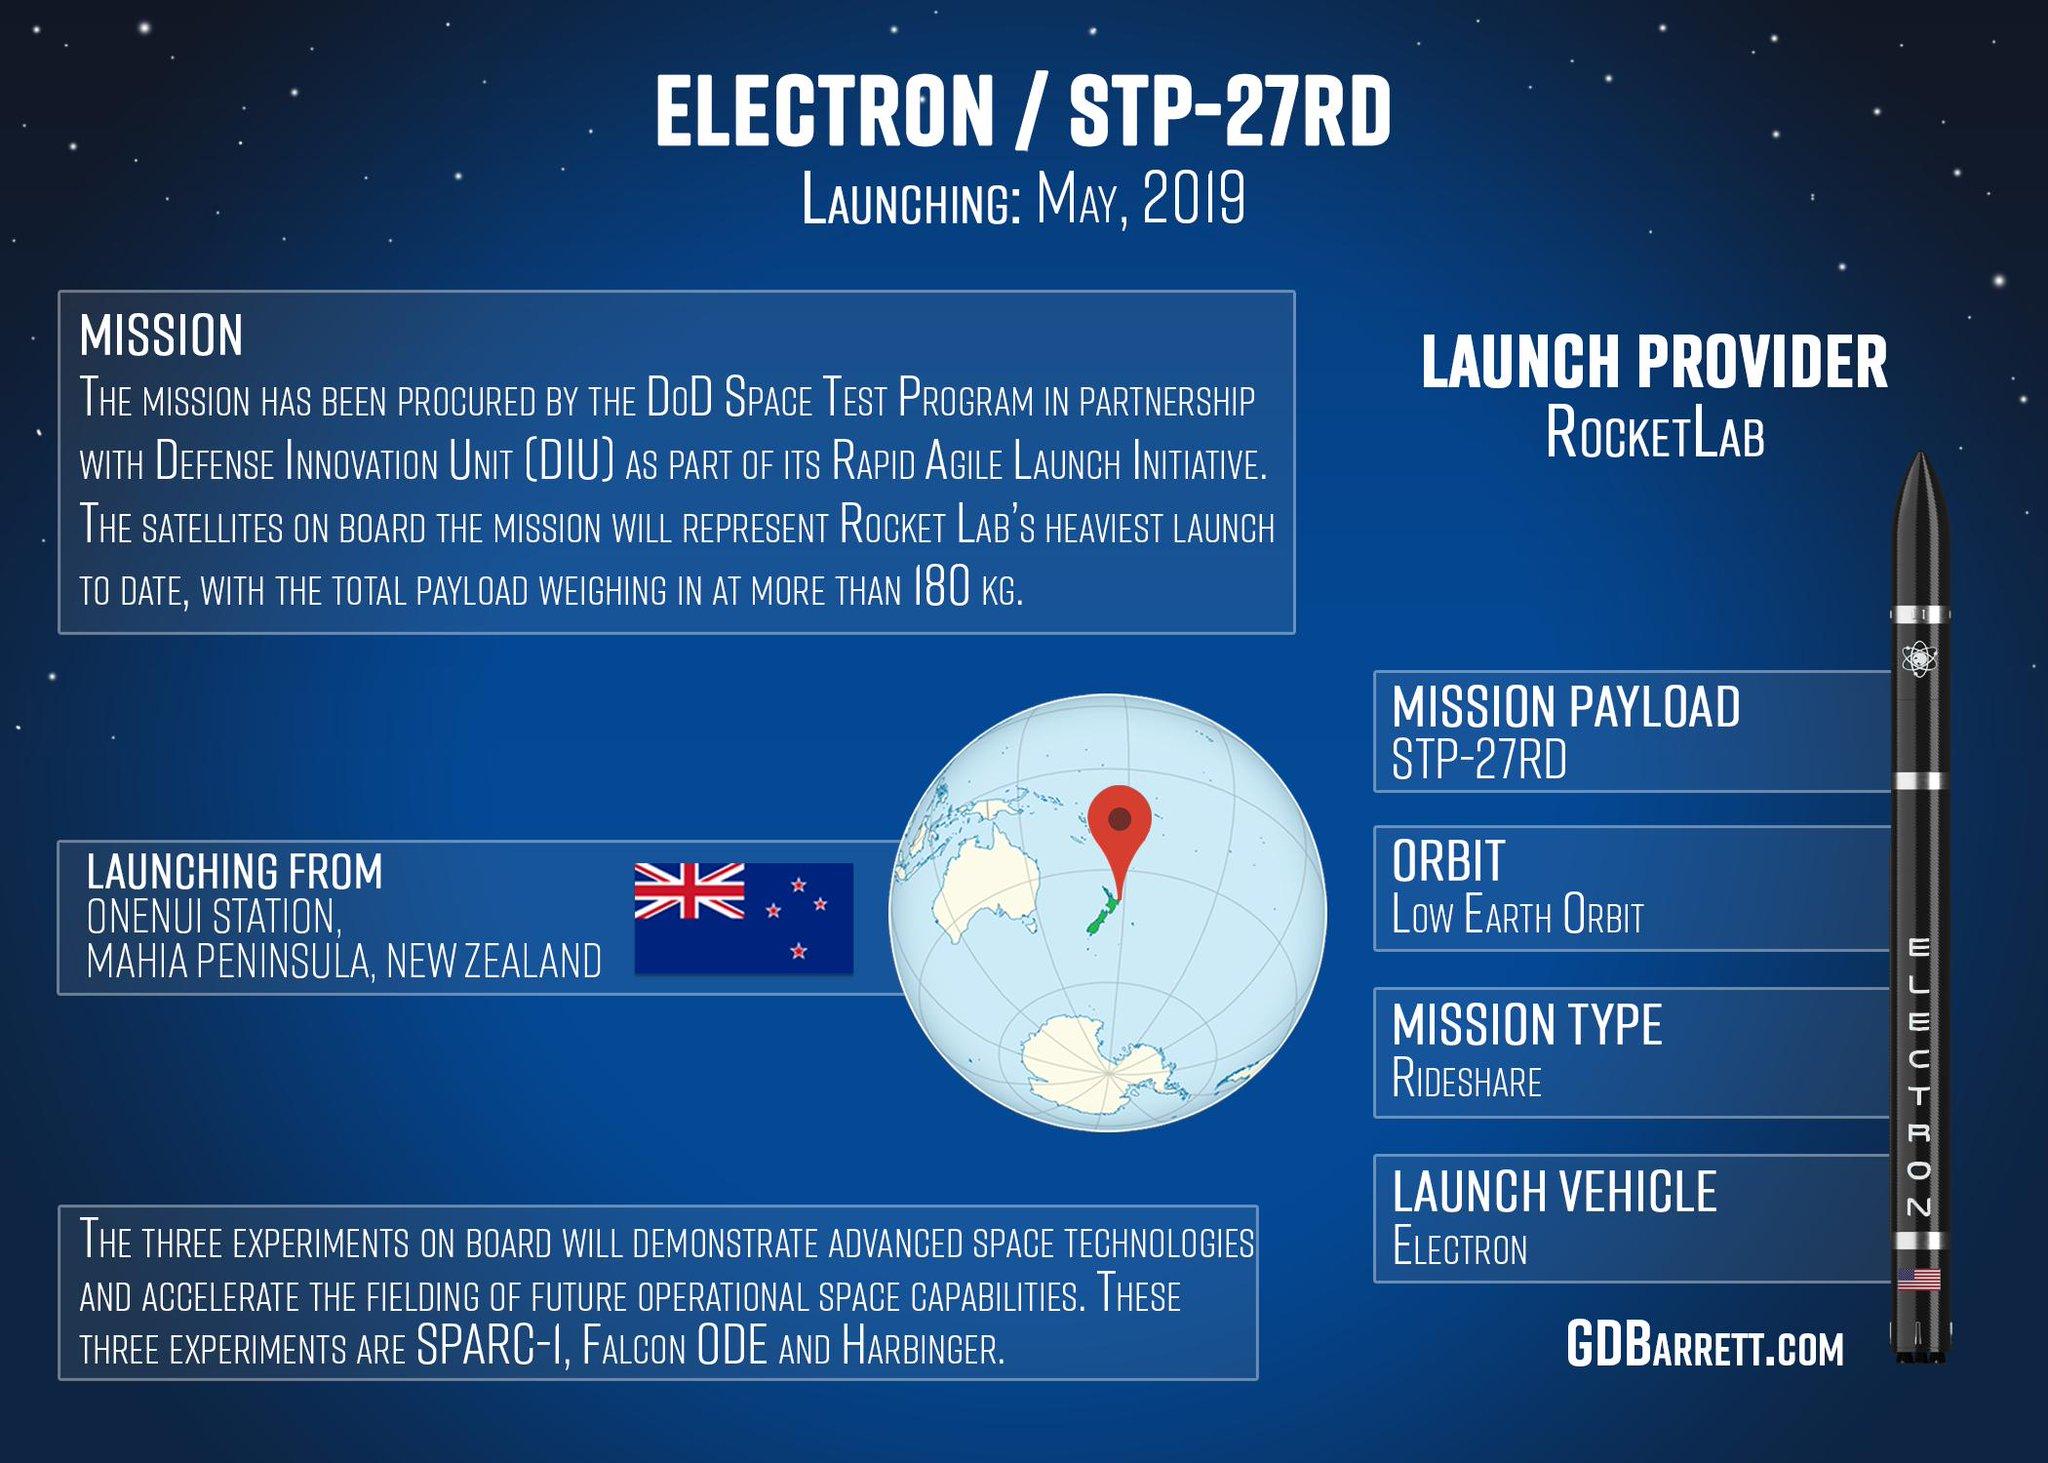 Rocket Lab Electron STP-27RD